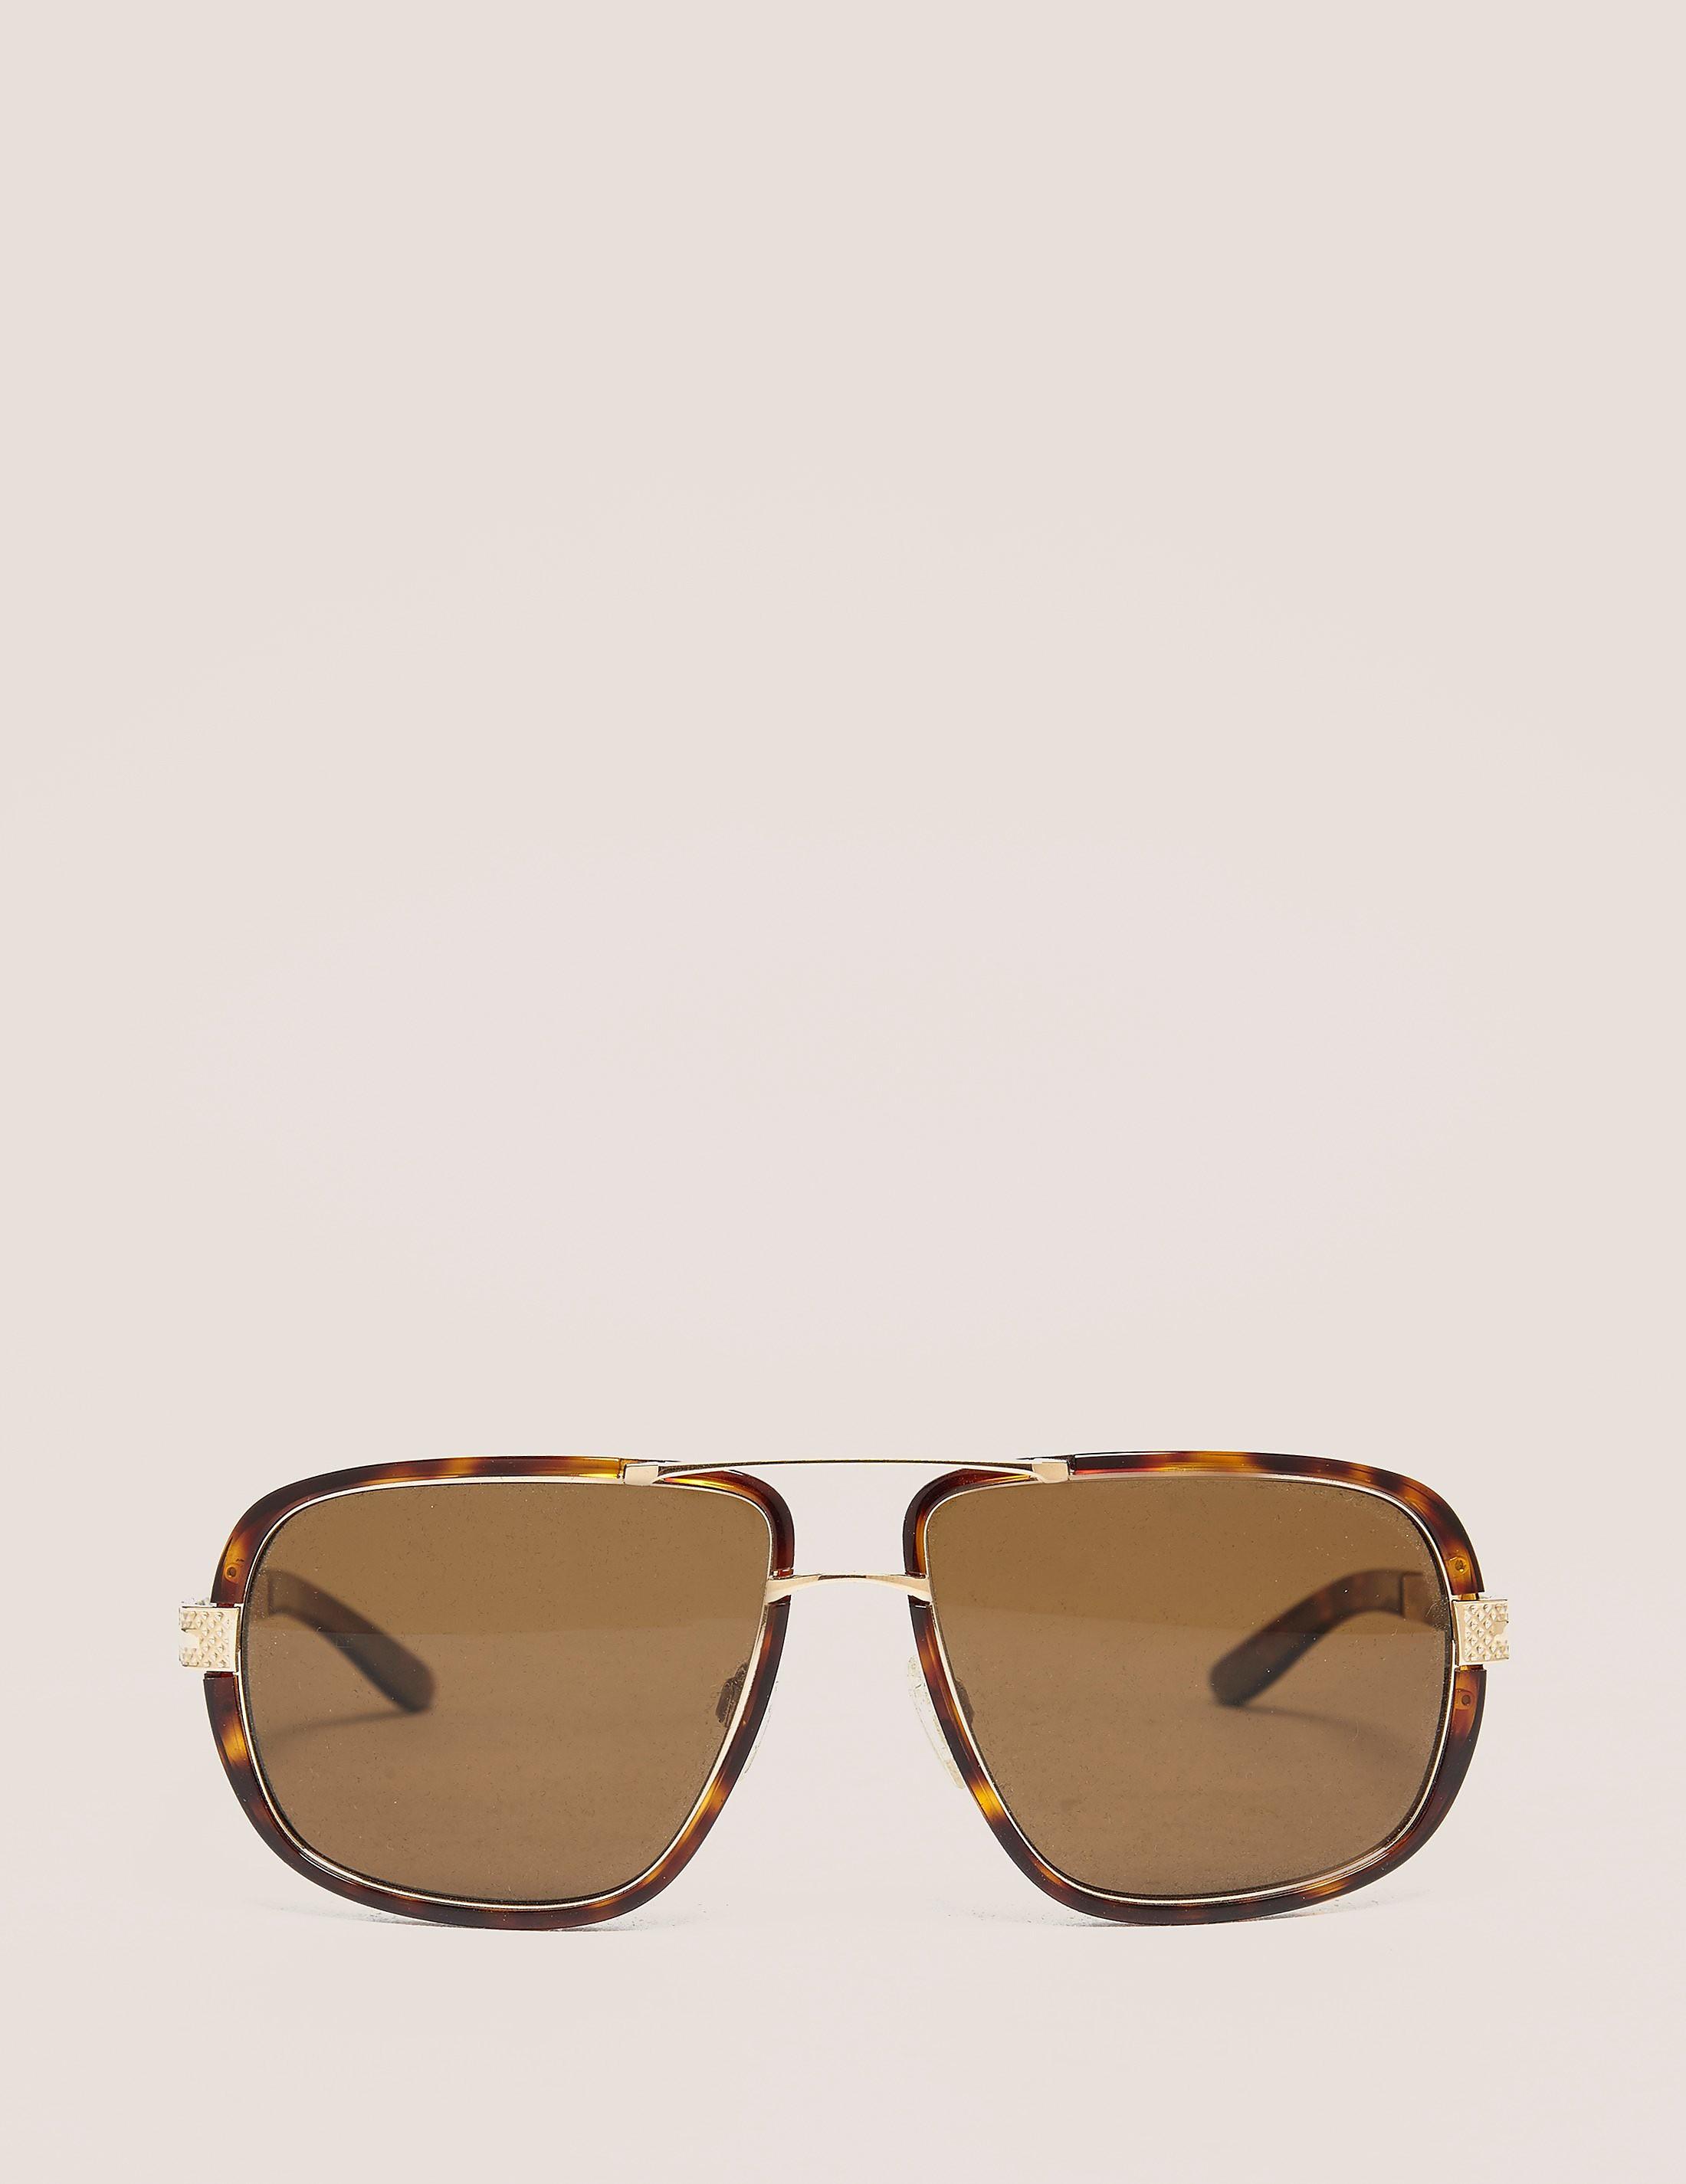 Oxford Vaughan Monza Sunglasses